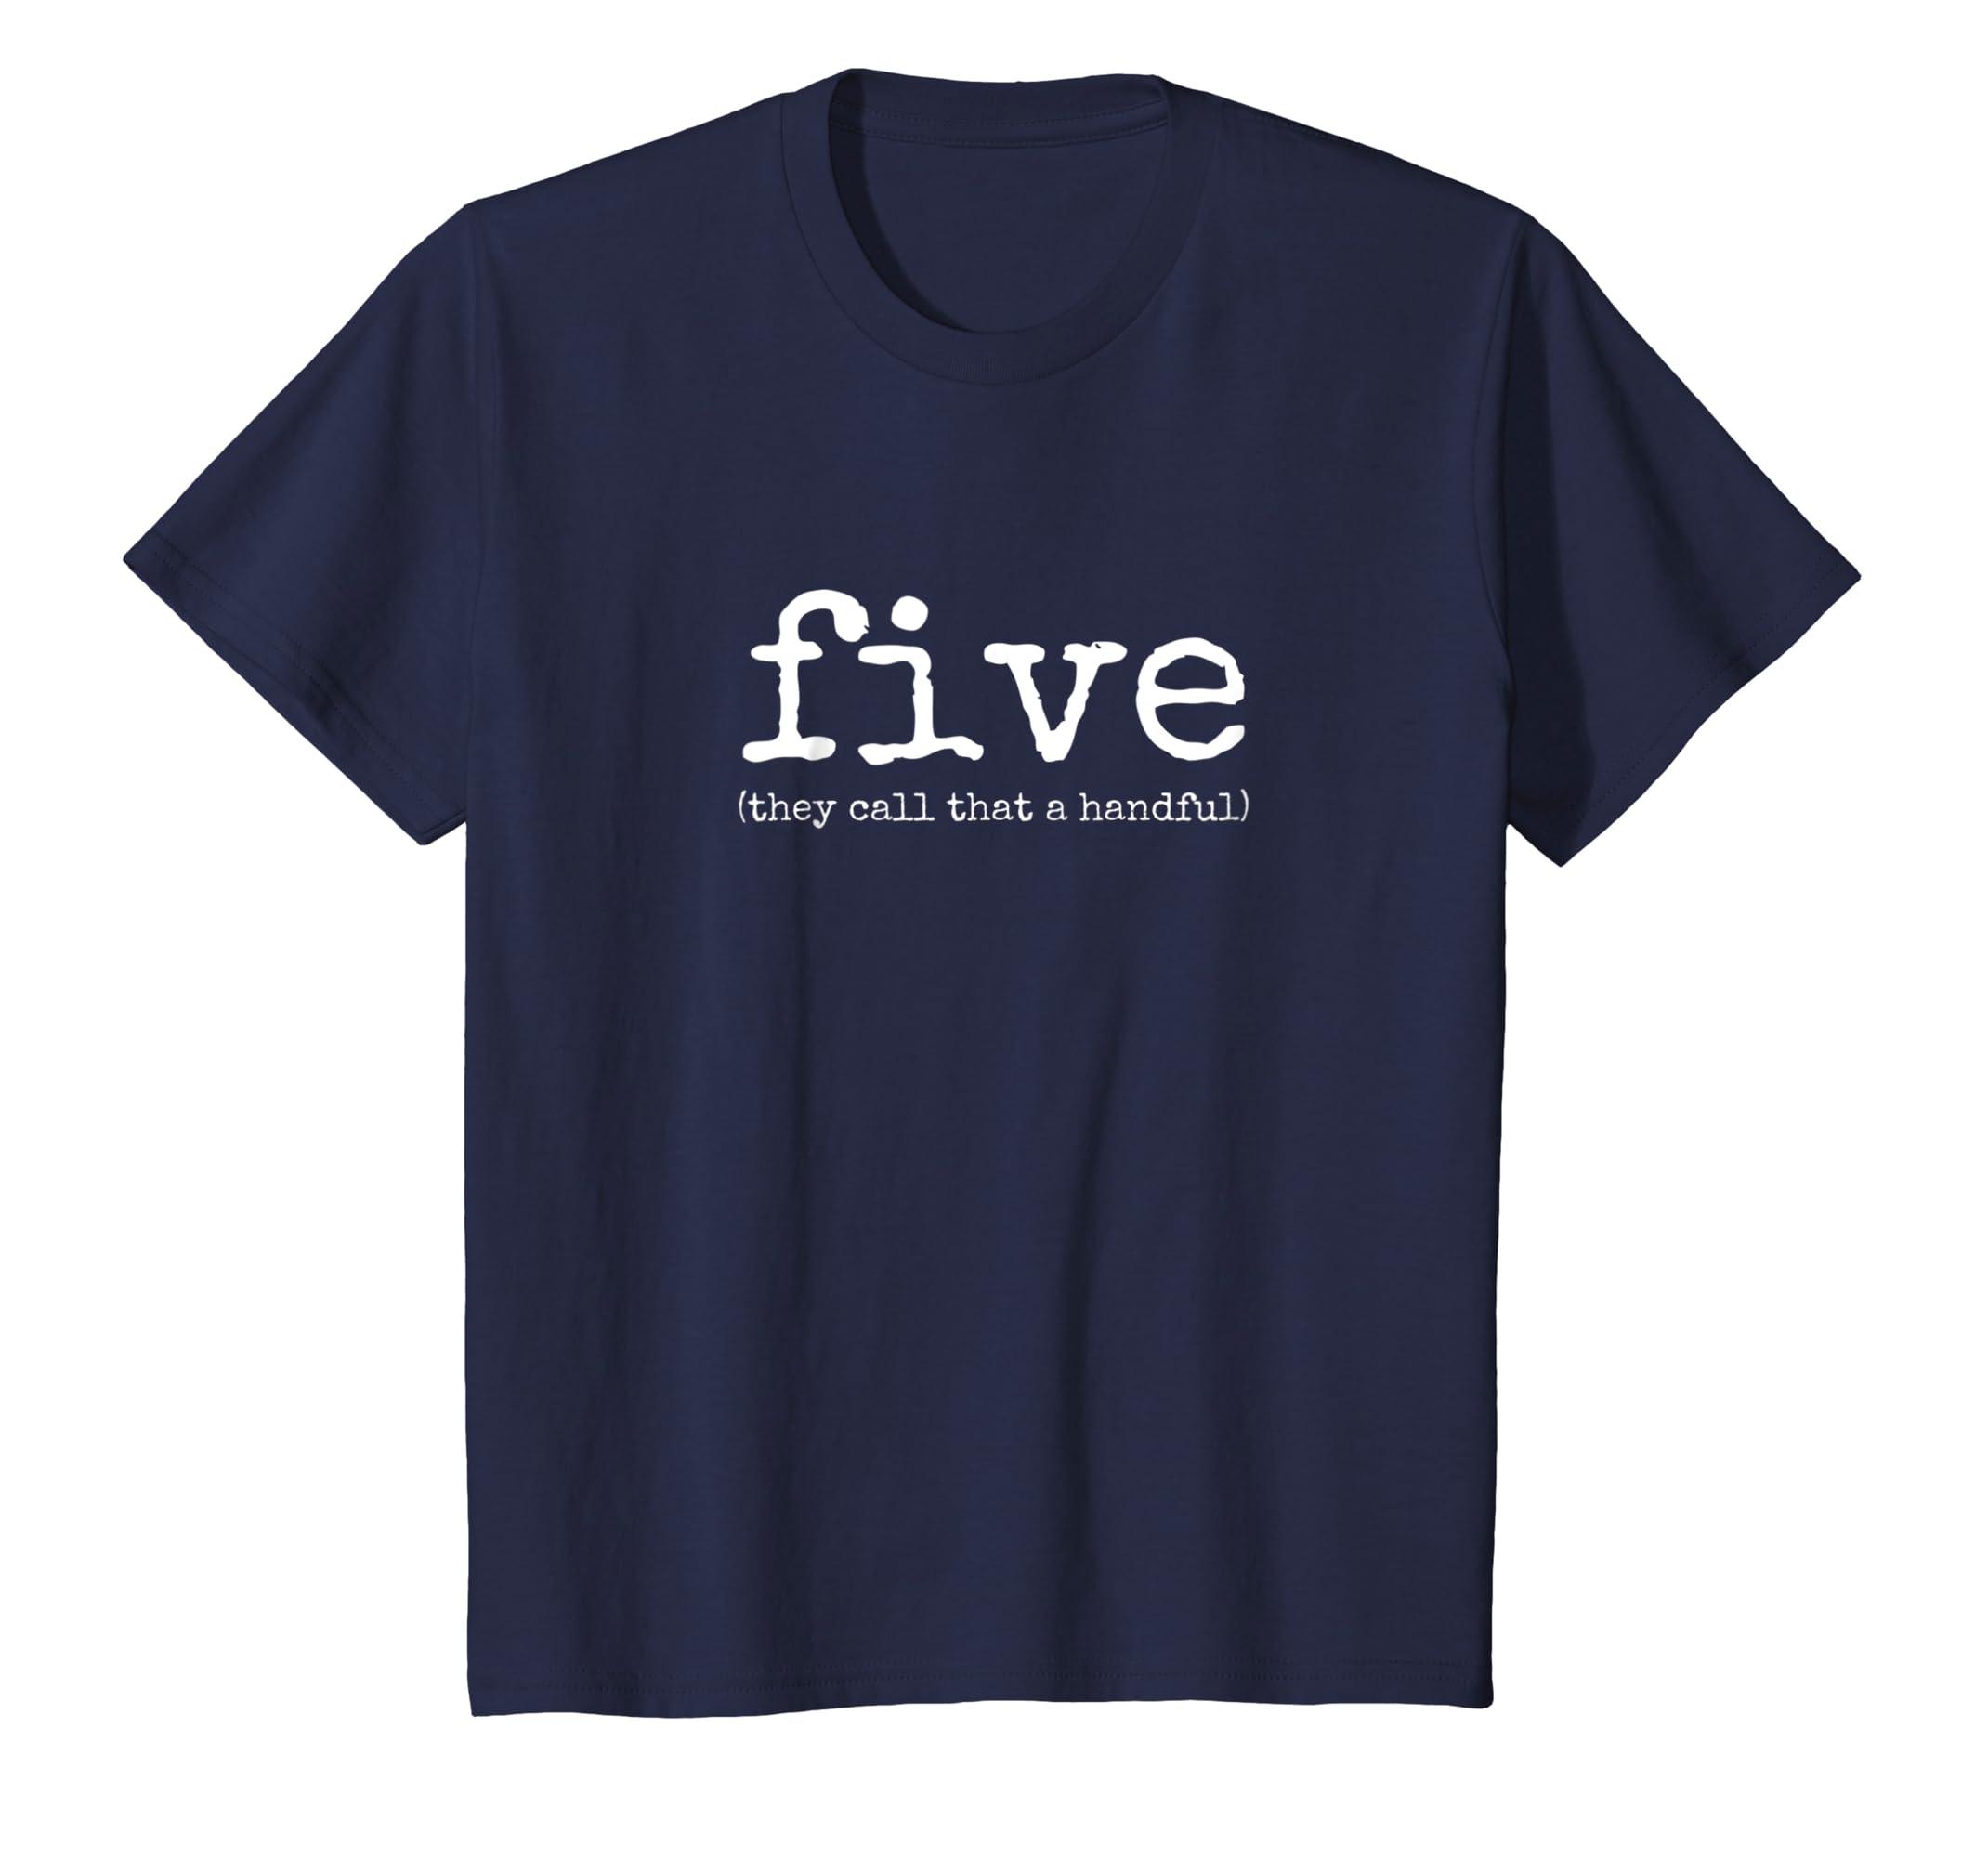 Amazon Kids 5th Birthday Shirt For Boys